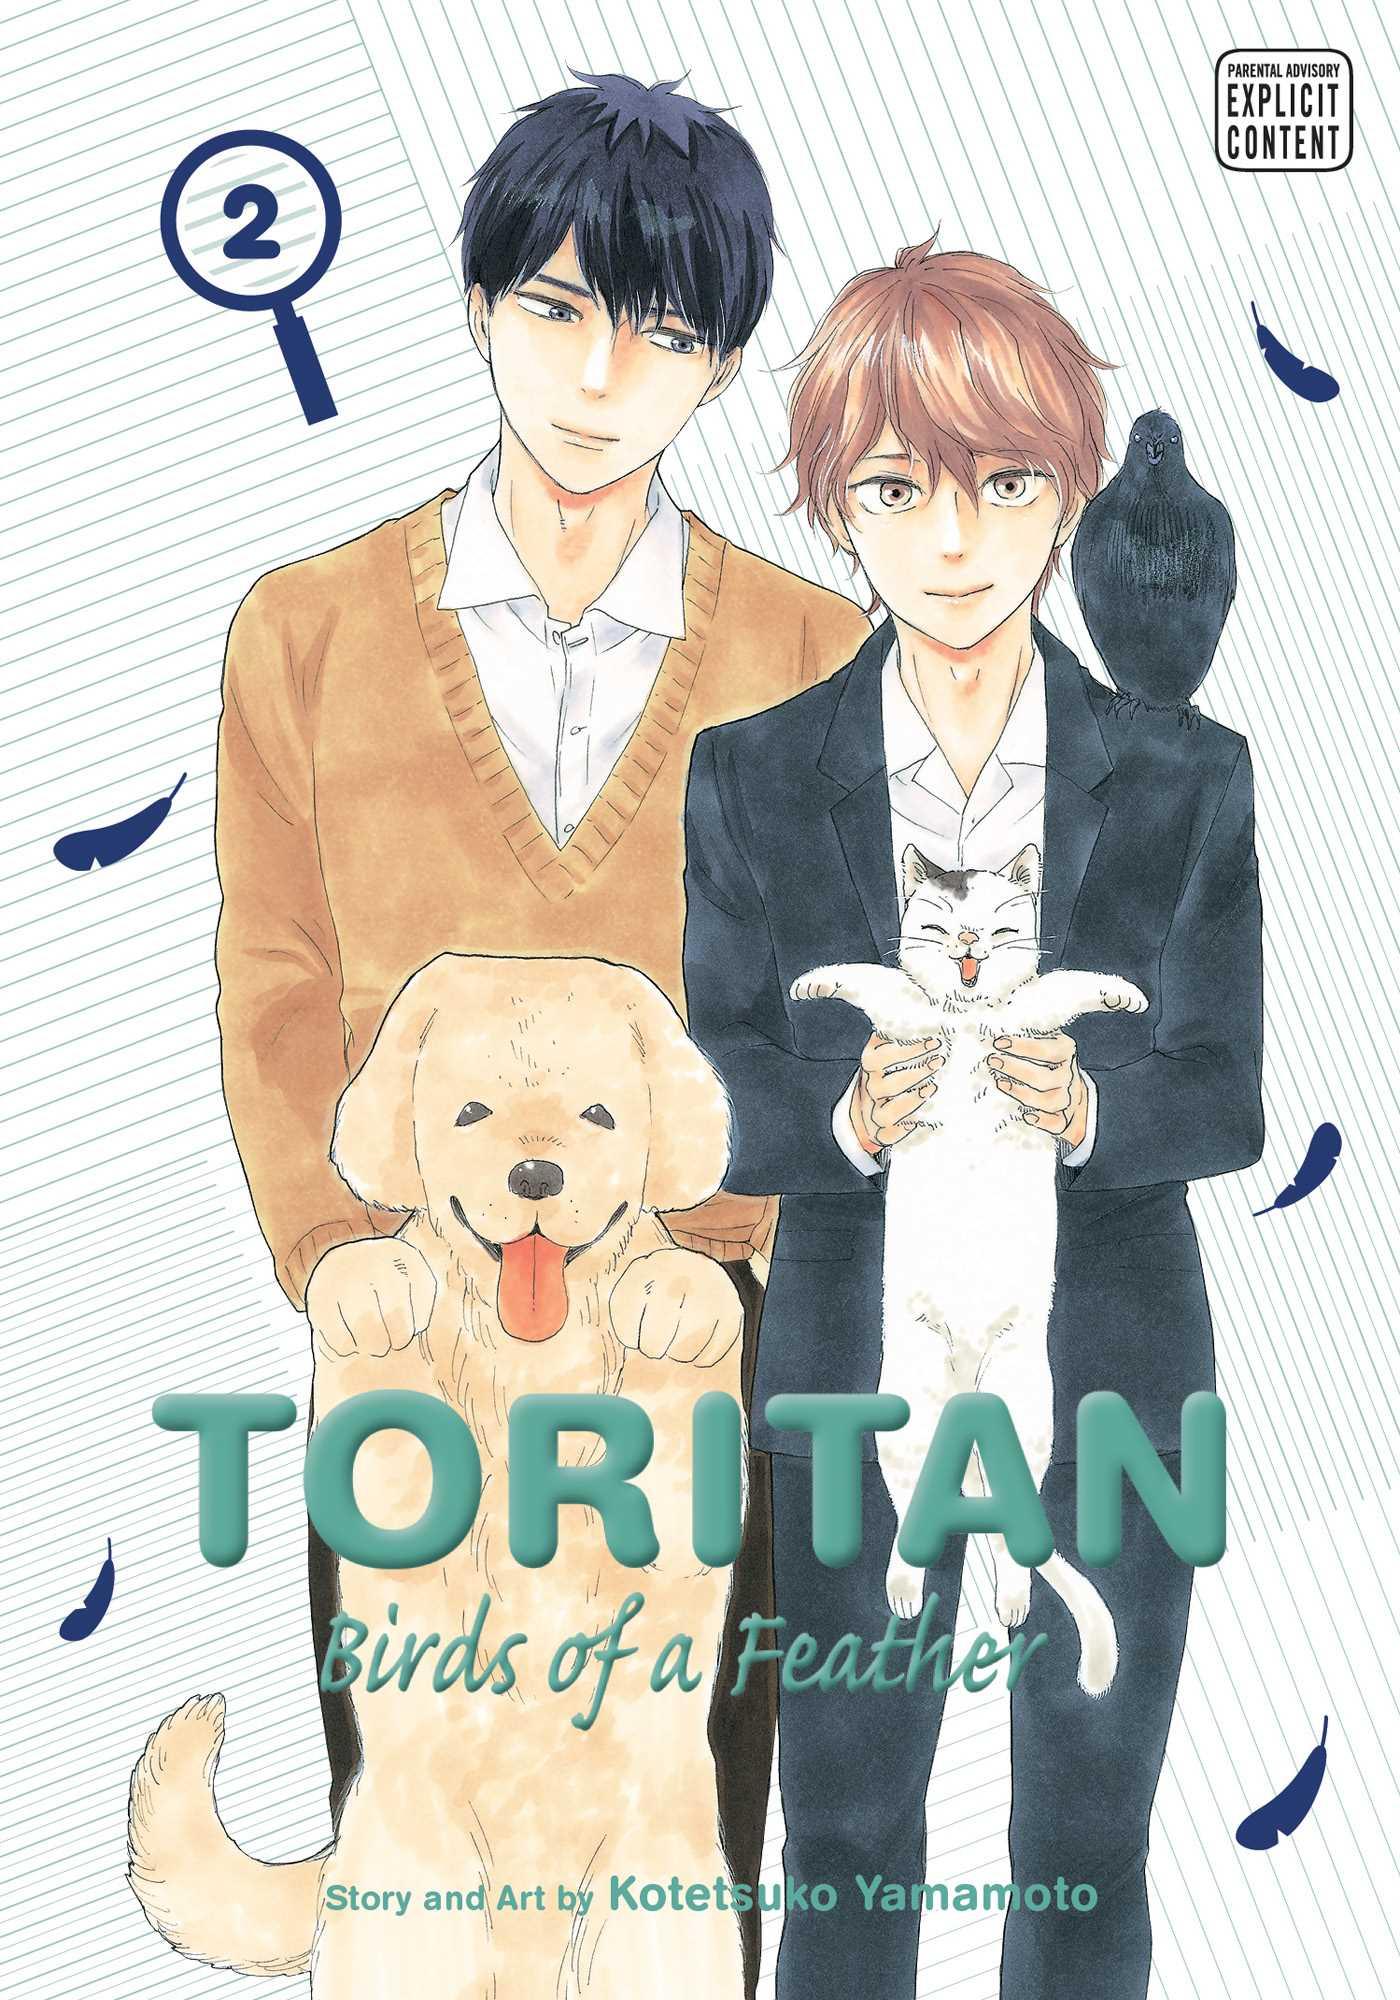 Toritan: Birds of a Feather, Vol. 2